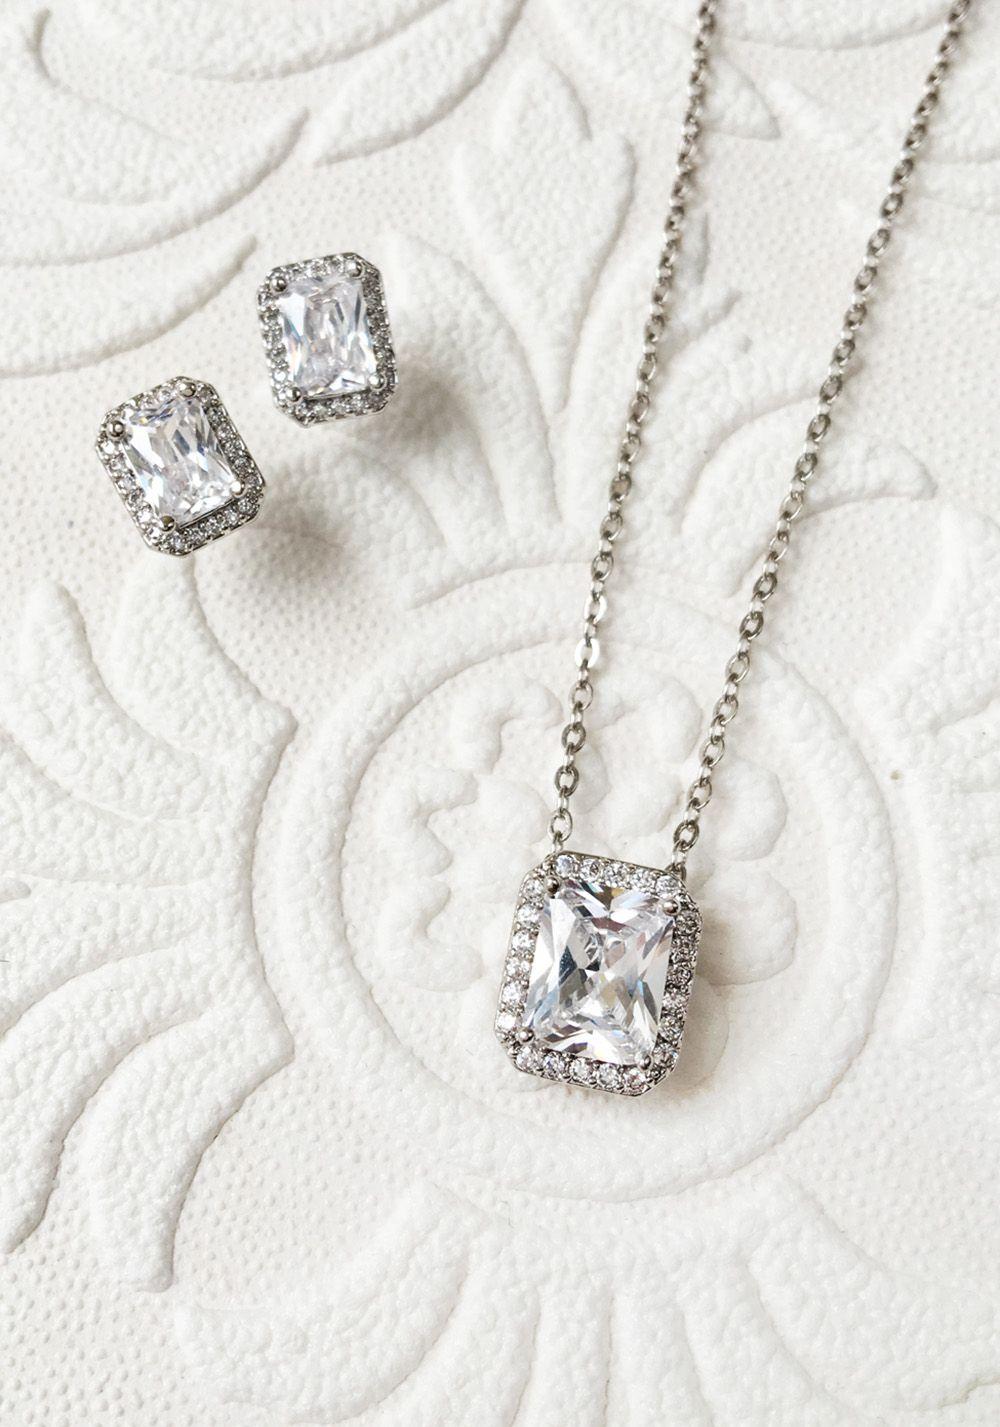 ca2d04276 Emerald cut 18K White Gold Cubic Zirconia Necklace Set Bridal Jewelry